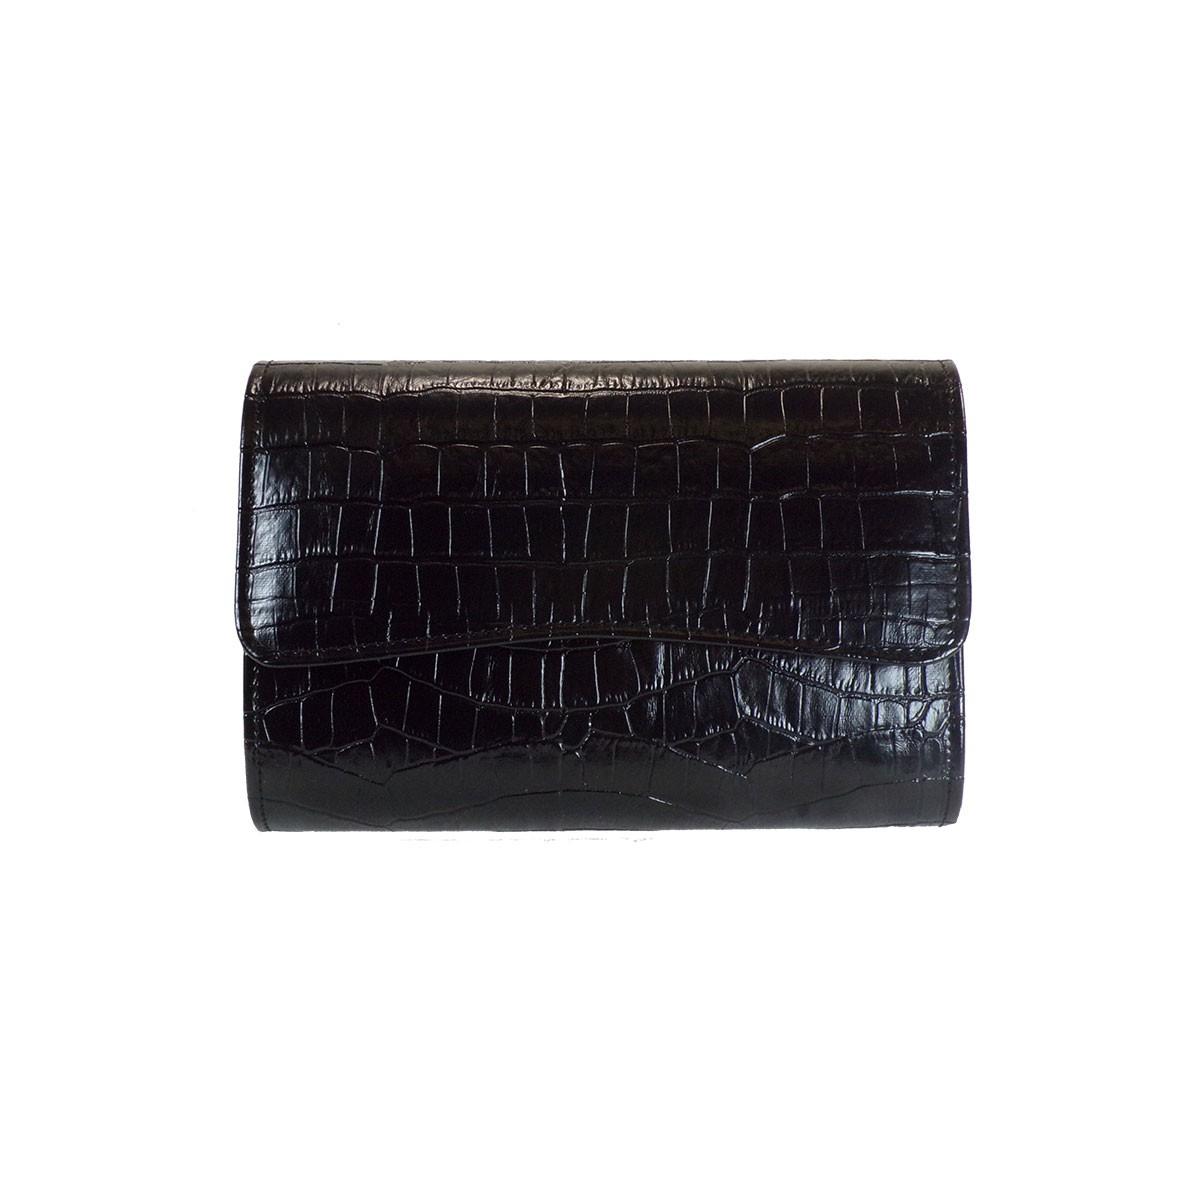 Bagiota Shoes Bags Γυναικεία Βραδινά Τσαντάκια 1016- Μαύρο Κροκό